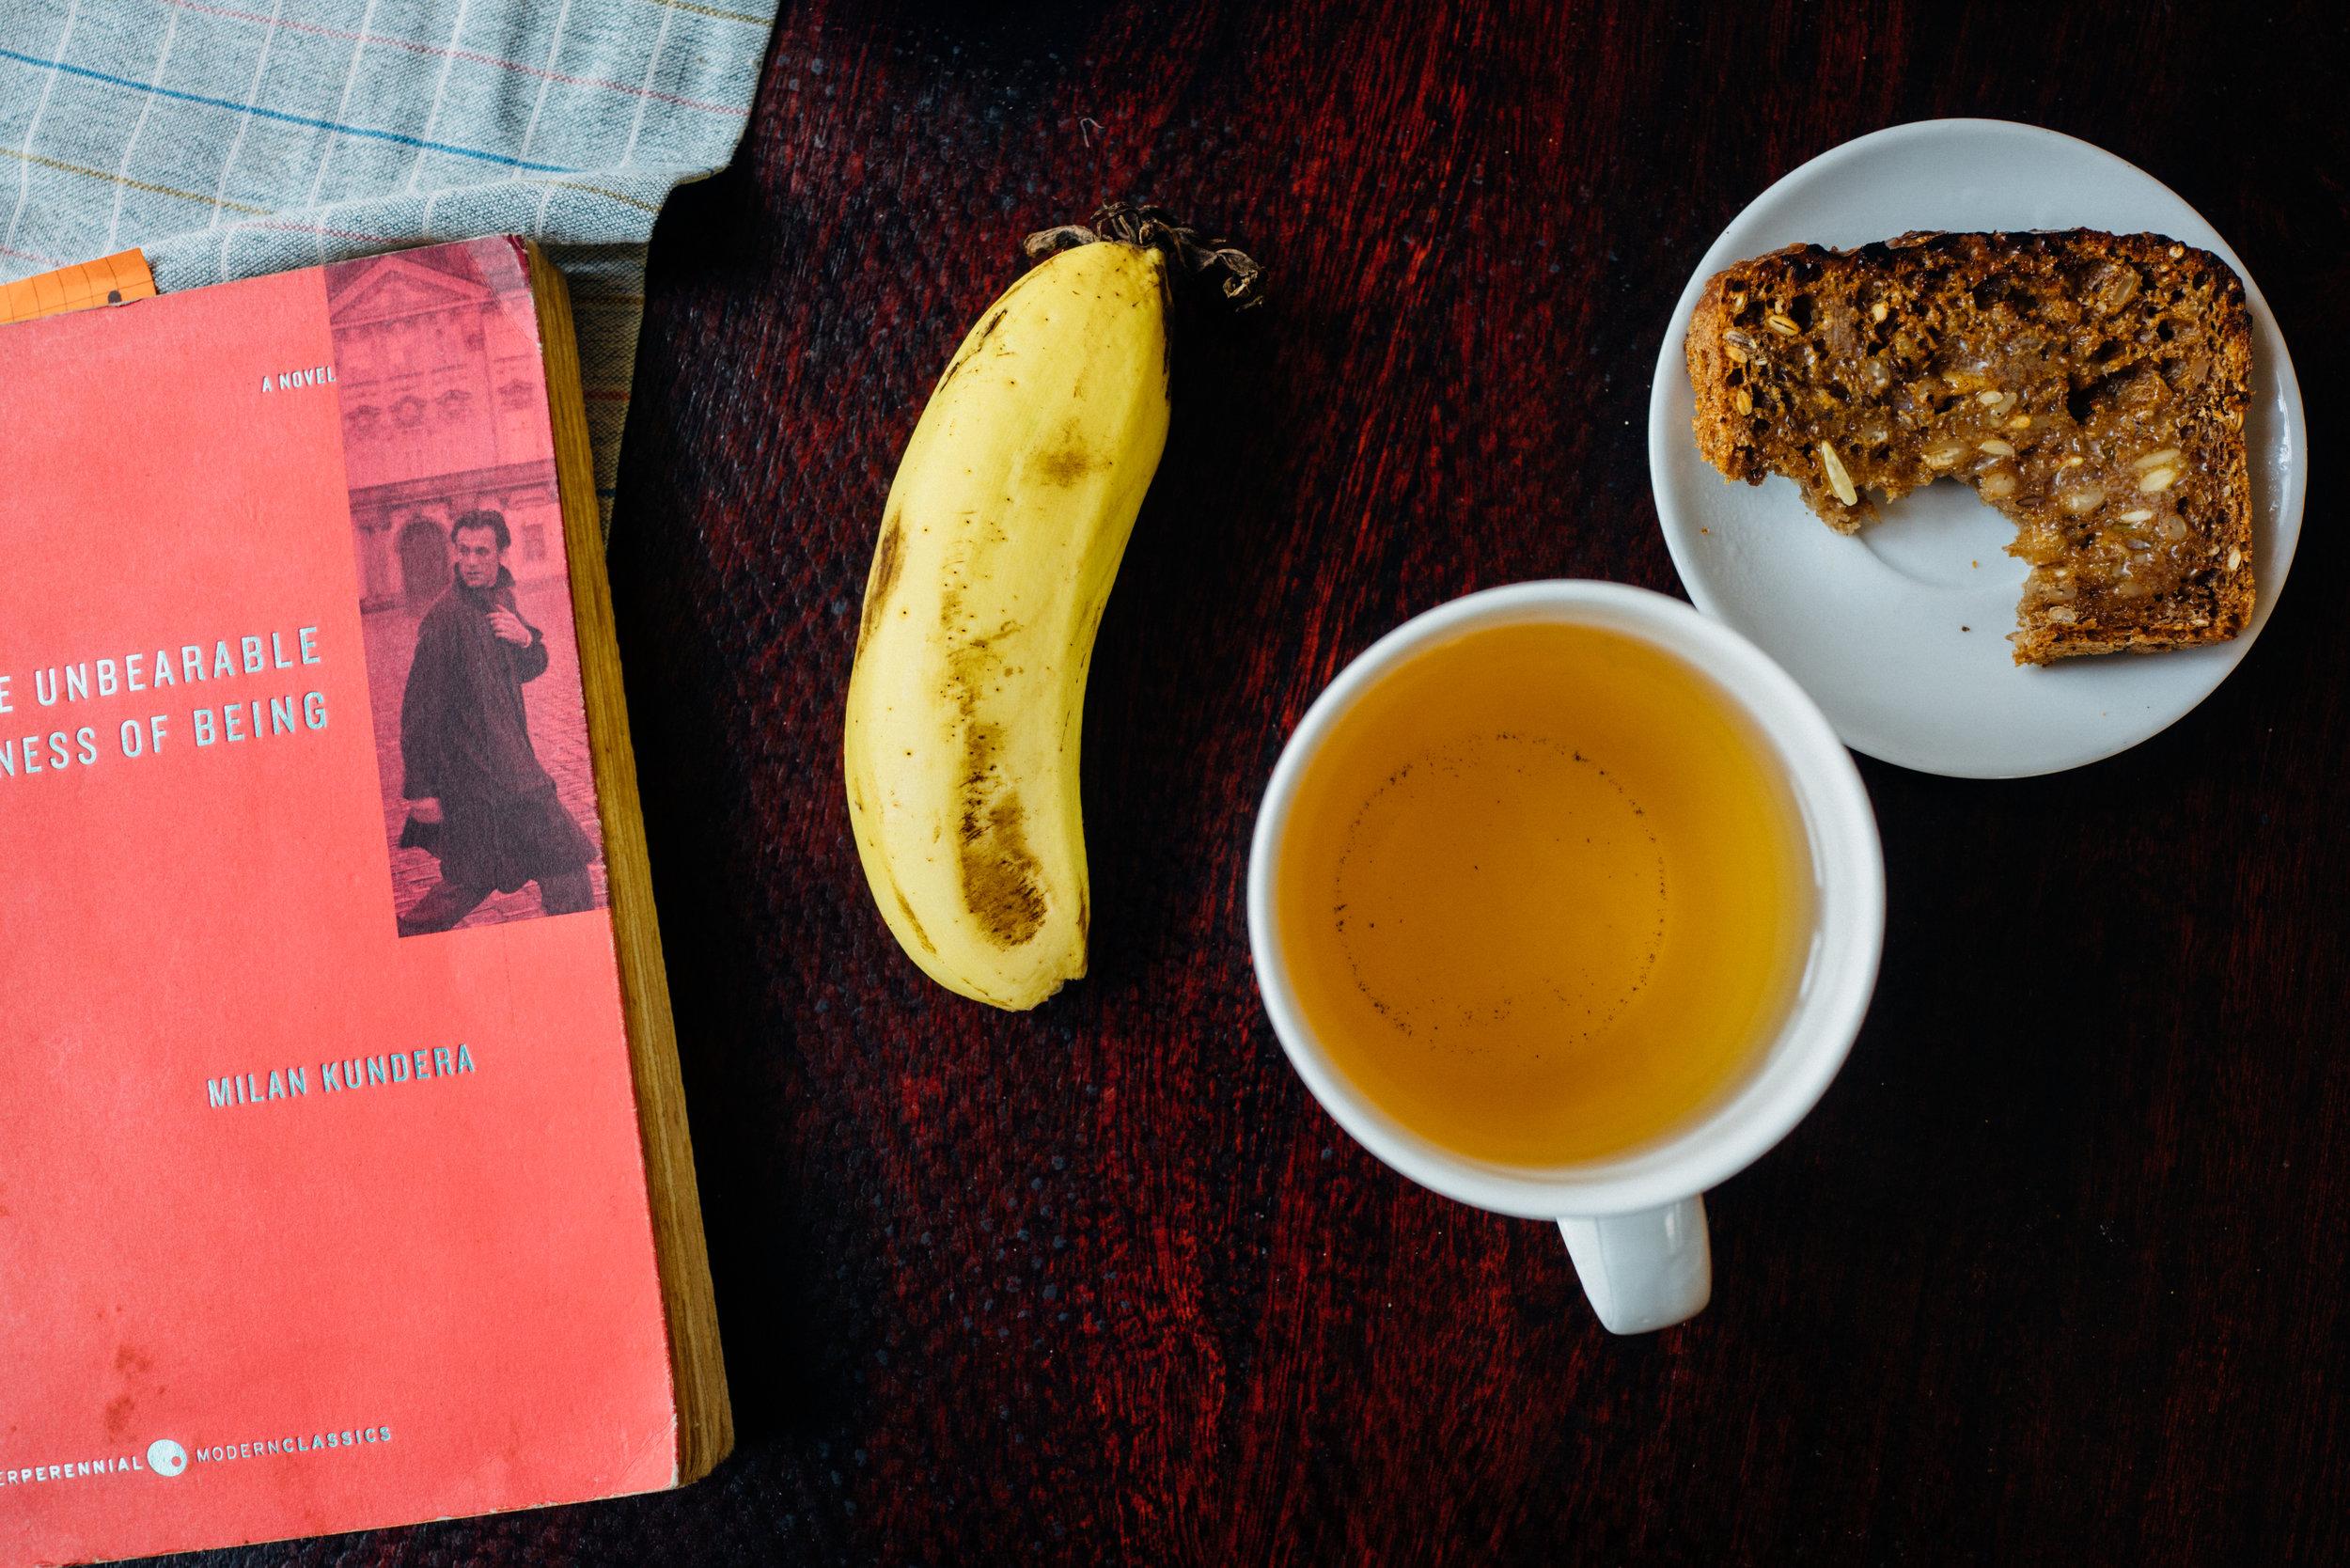 A Sunday breakfast for Mela: banana, dense rye bread with butter, green tea